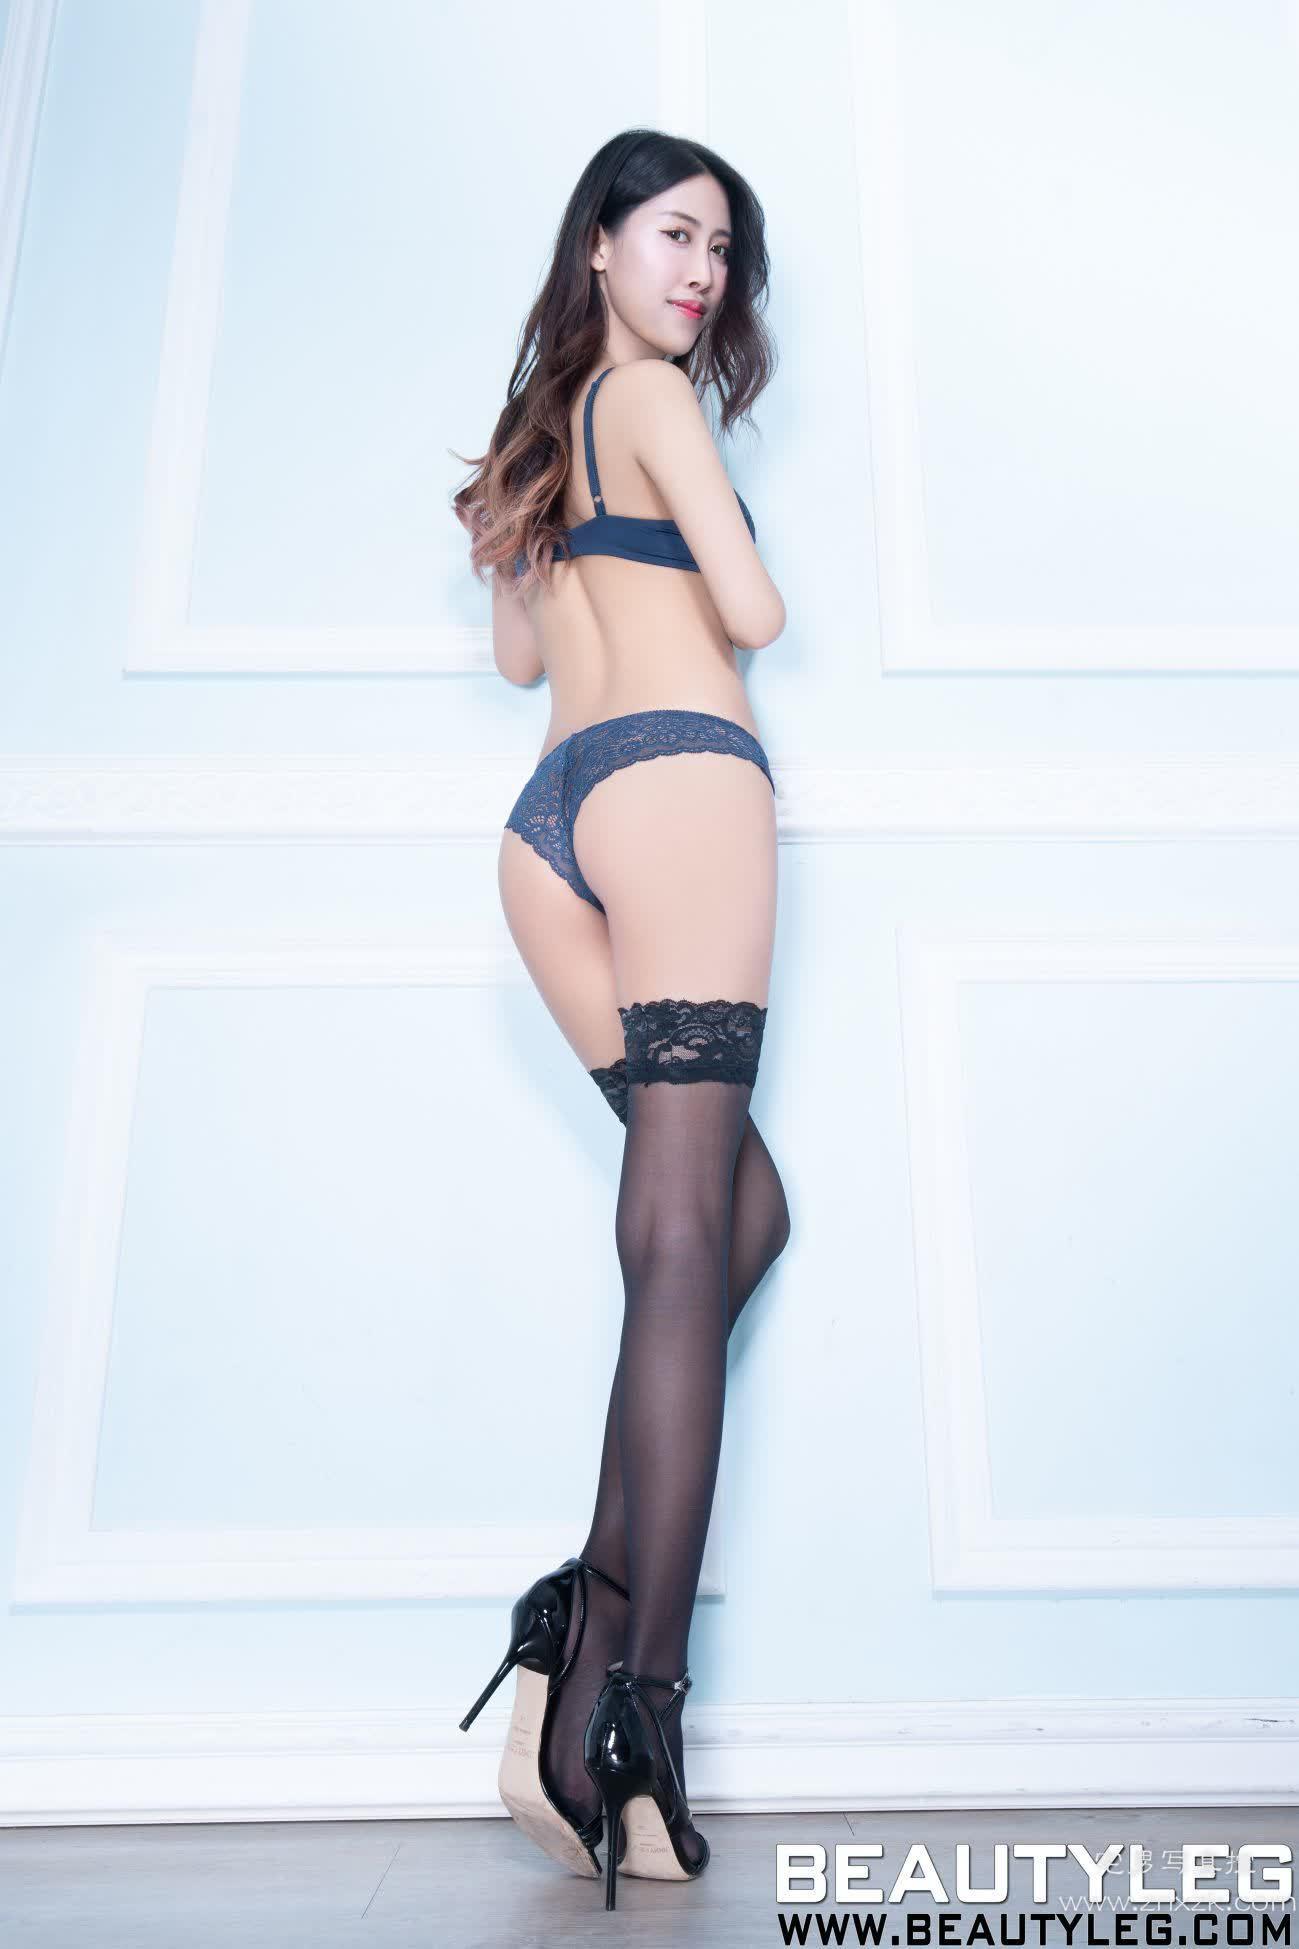 BEAUTYLEG台湾腿模写真 No.1673 Amber